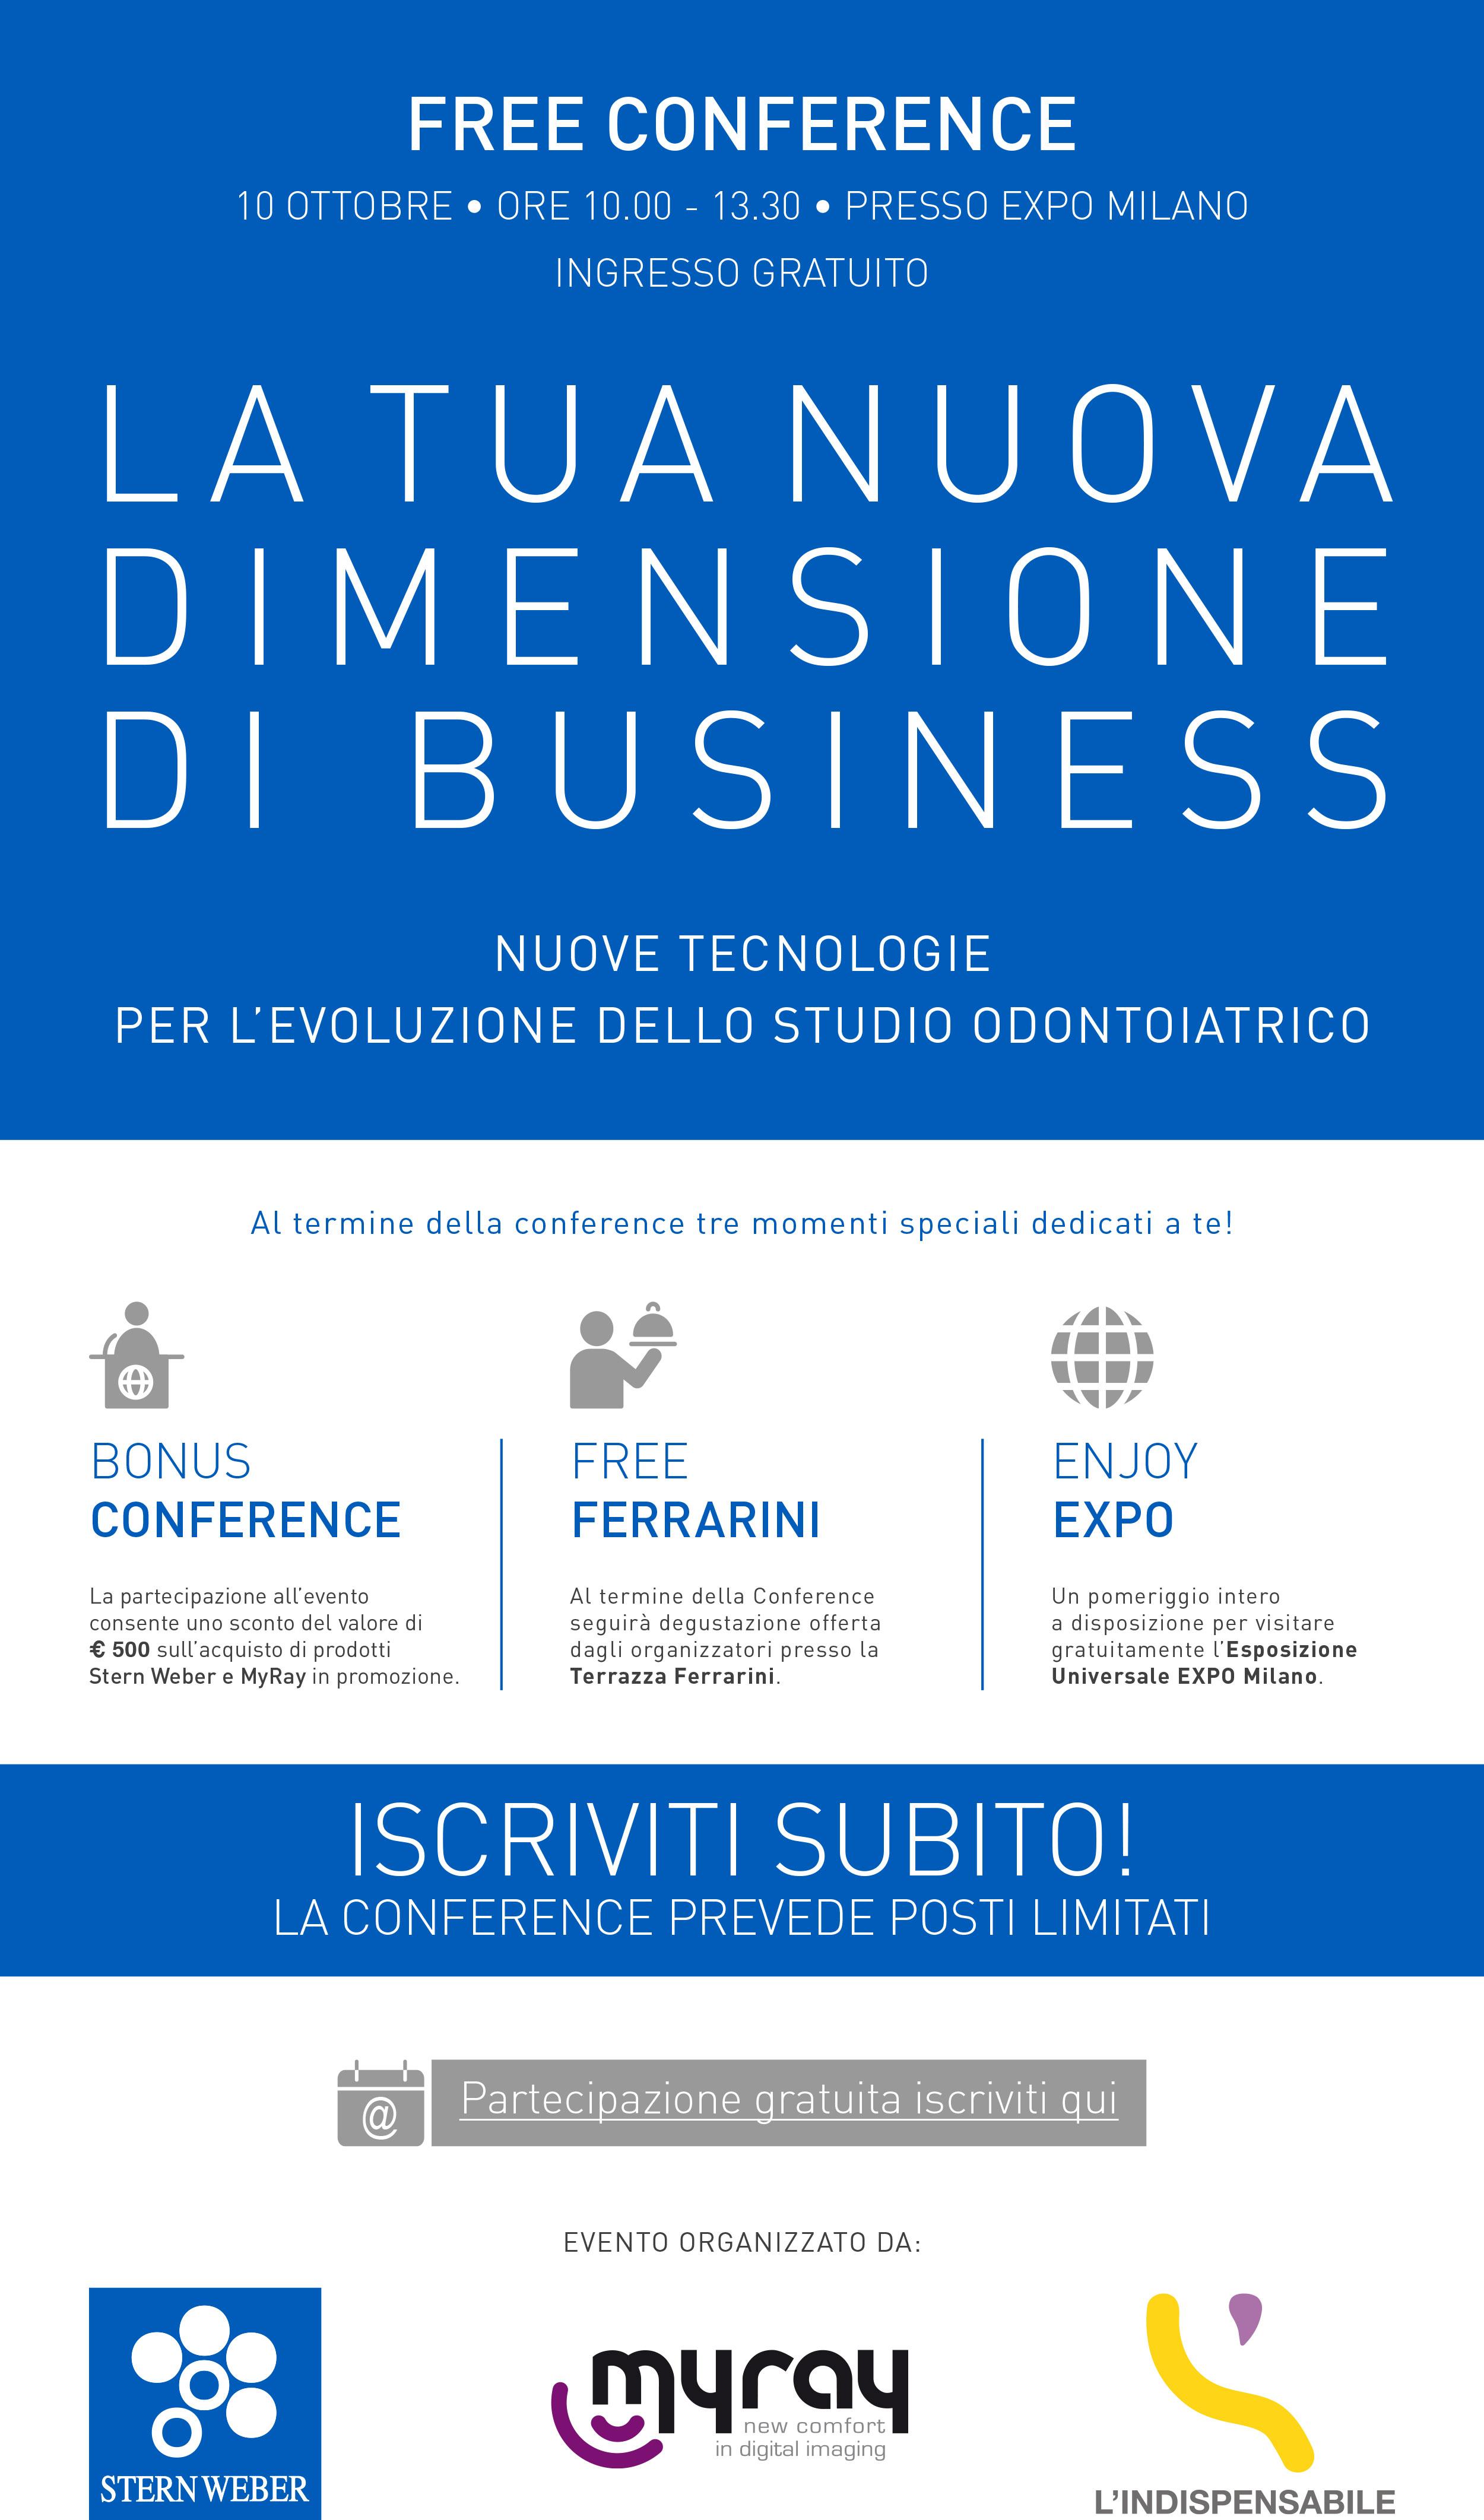 mazzola newletter_invitation correx LD last